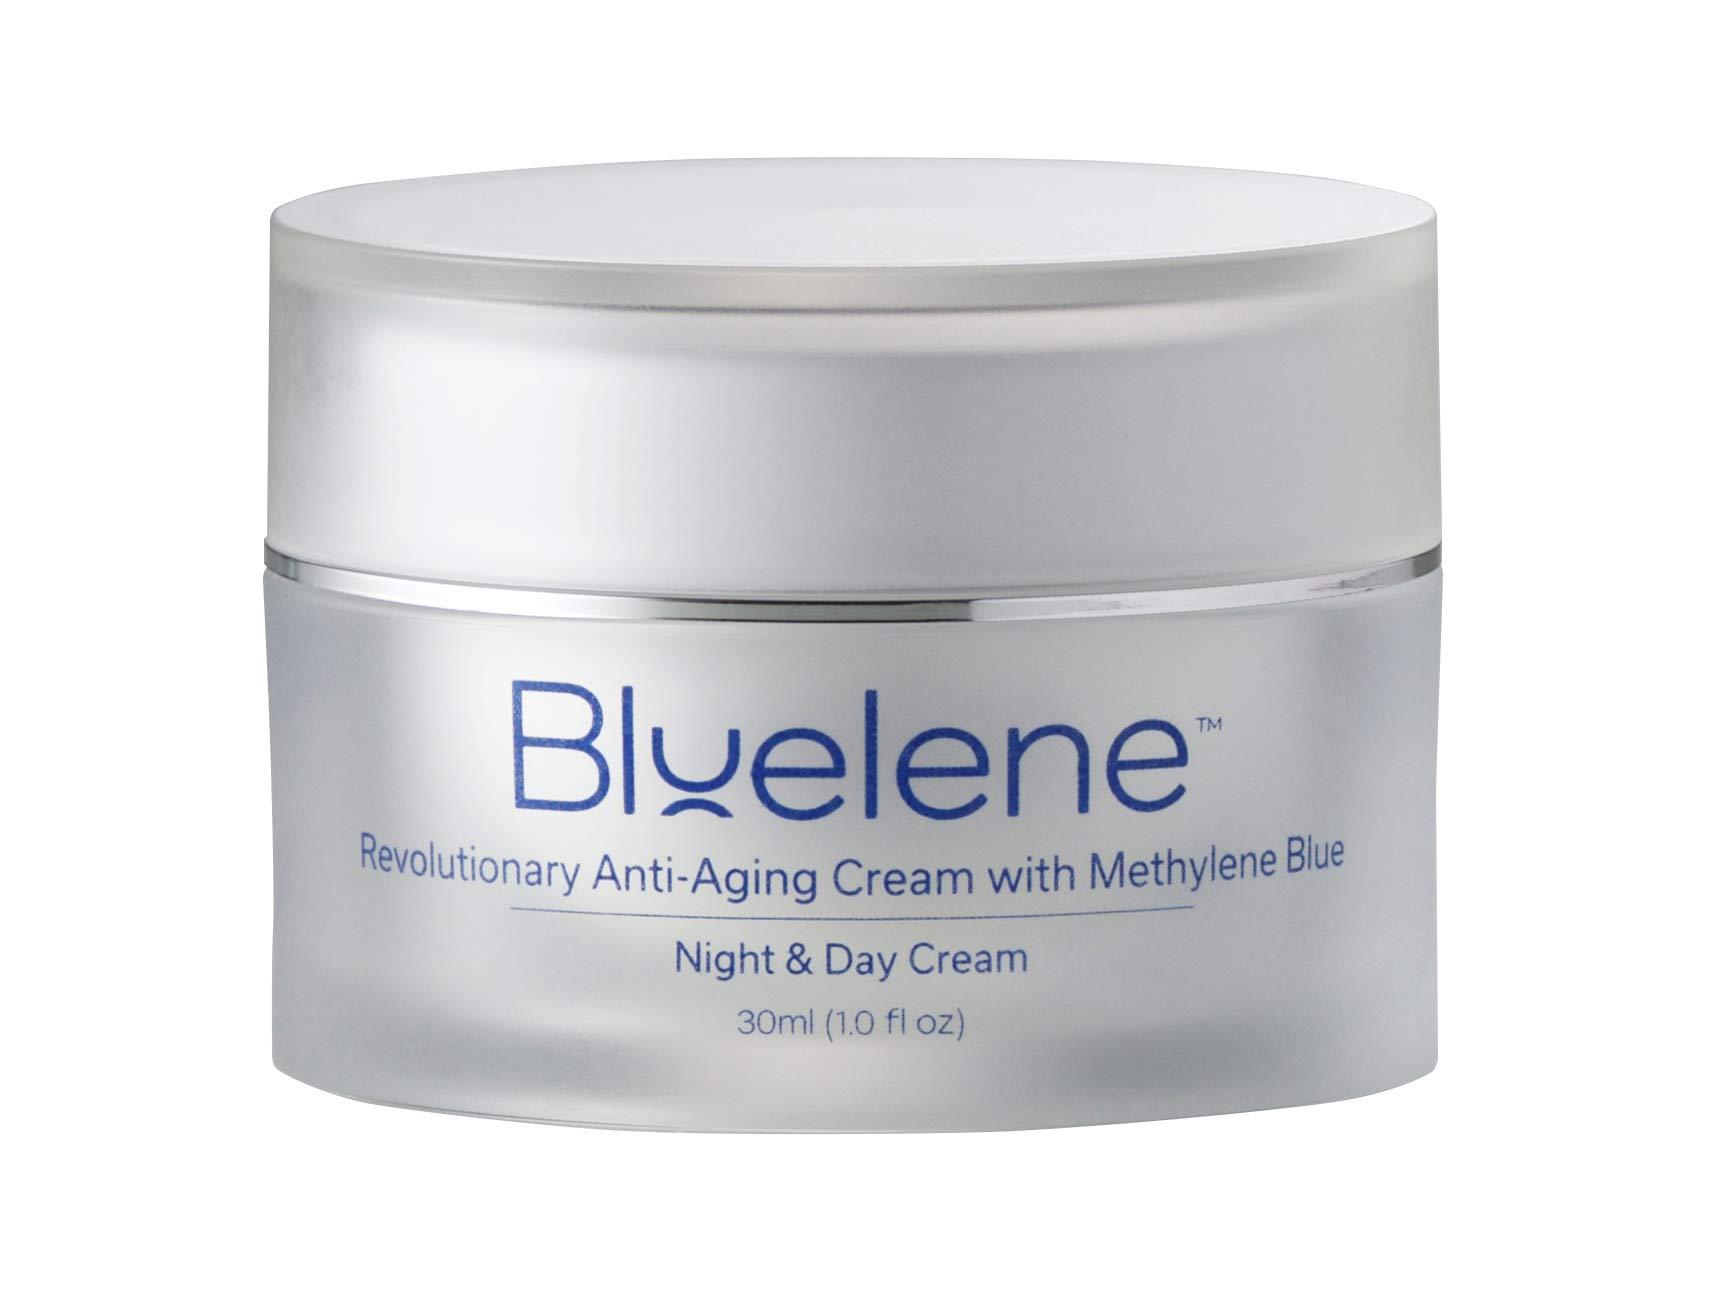 Anti Aging Day & Night Cream, Bluelene. Revolutionary Anti Wrinkle Face Cream with Methylene Blue (30 ml)